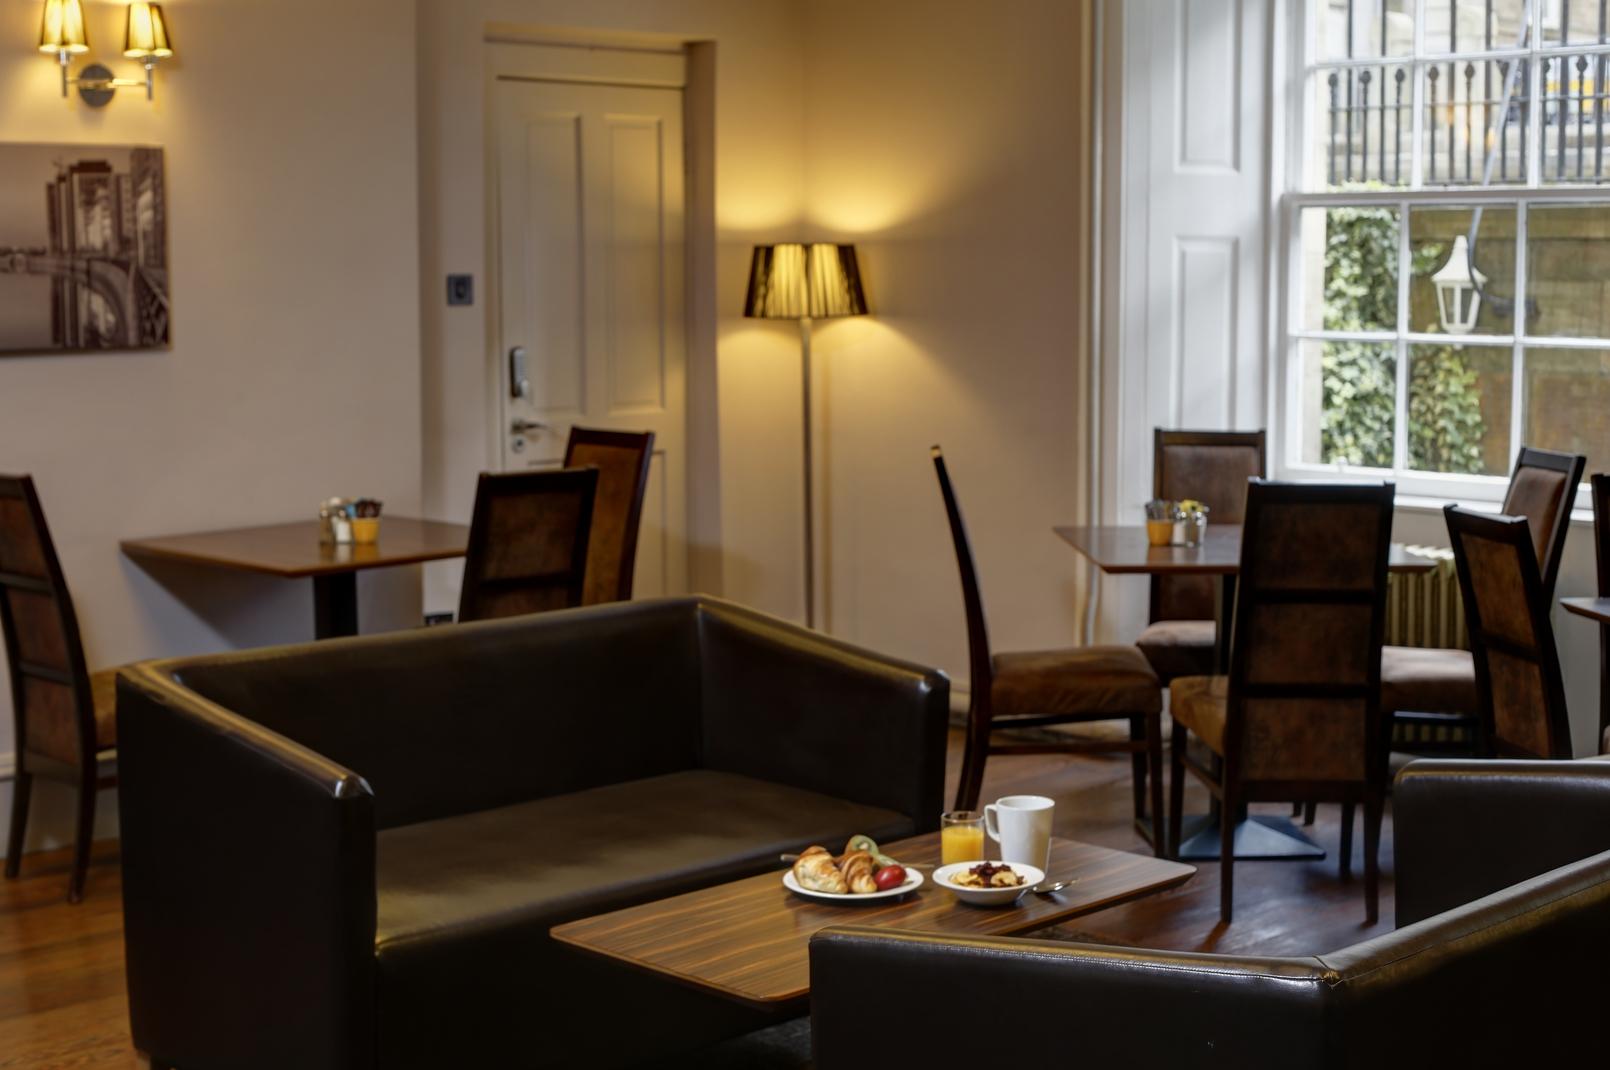 ... Glasgow City Hotel Dining 16 83525 ... Part 77